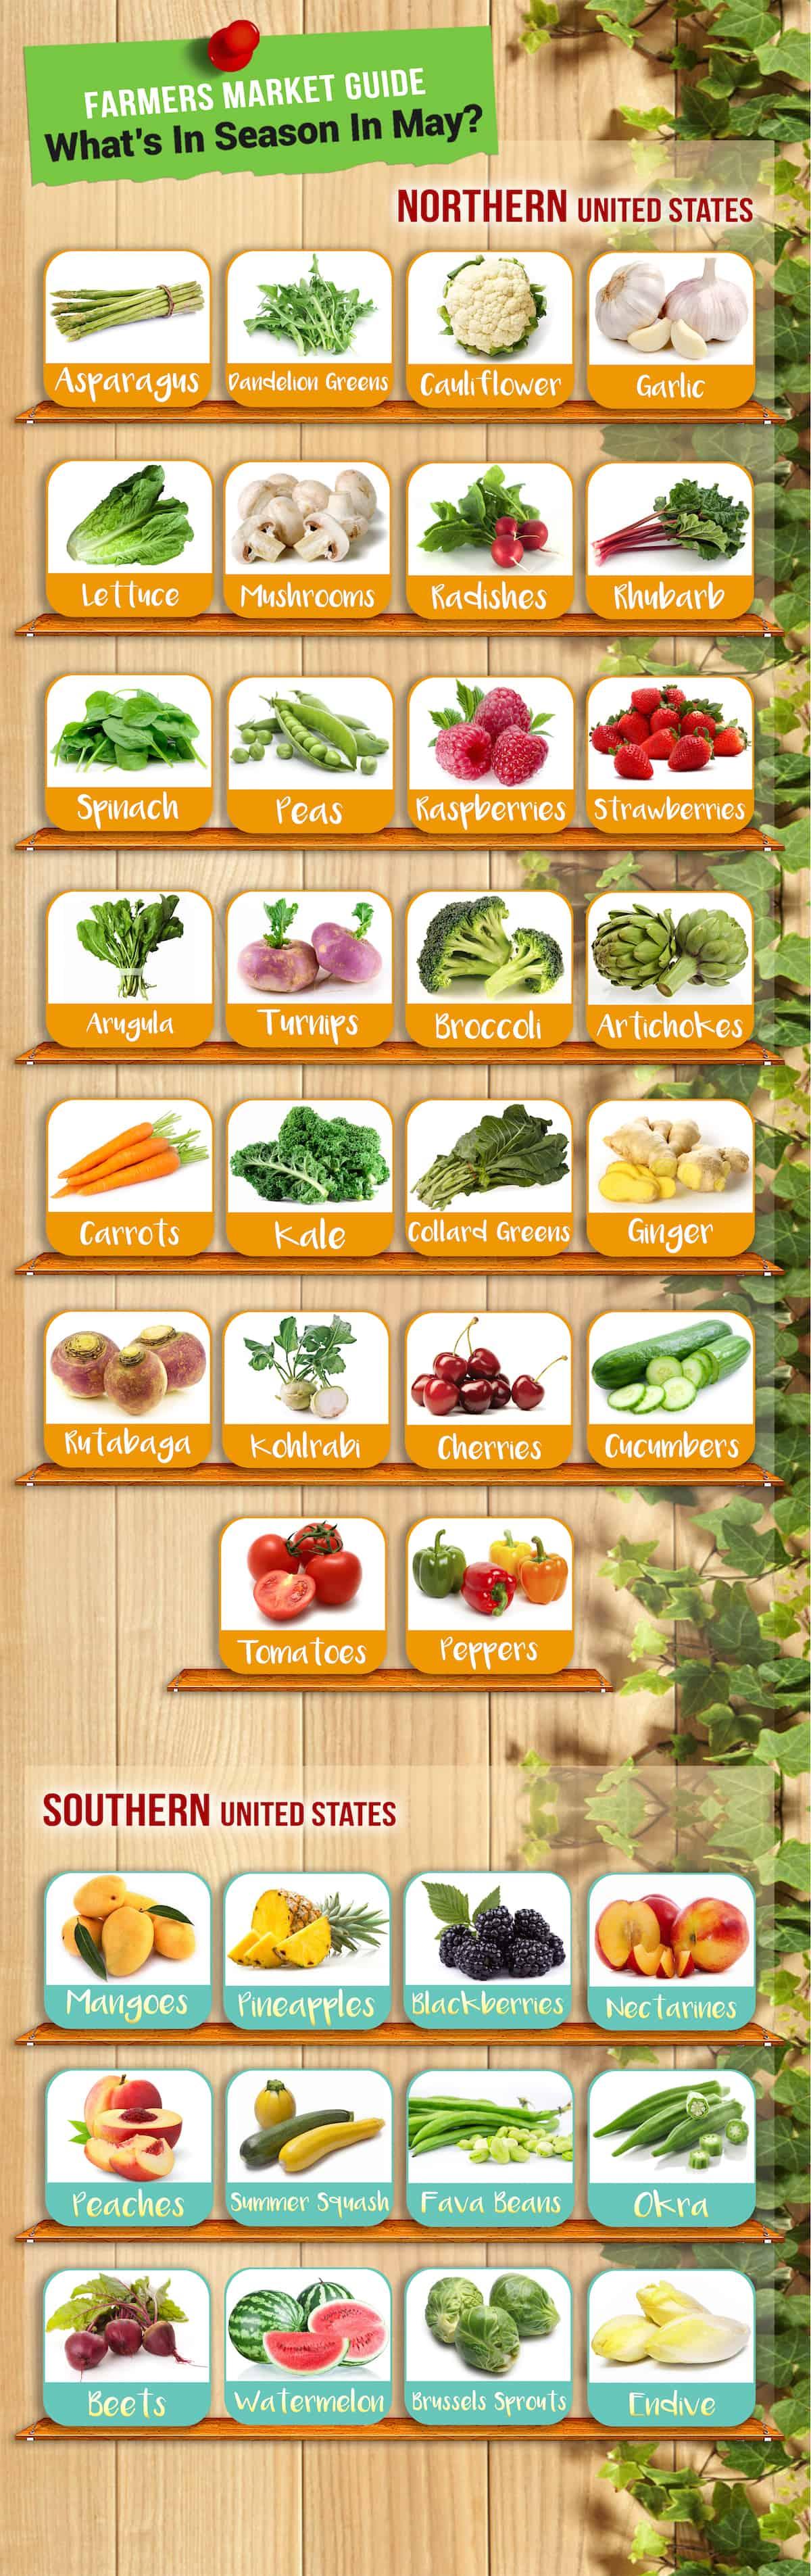 Farmer's Market Guide-May copy